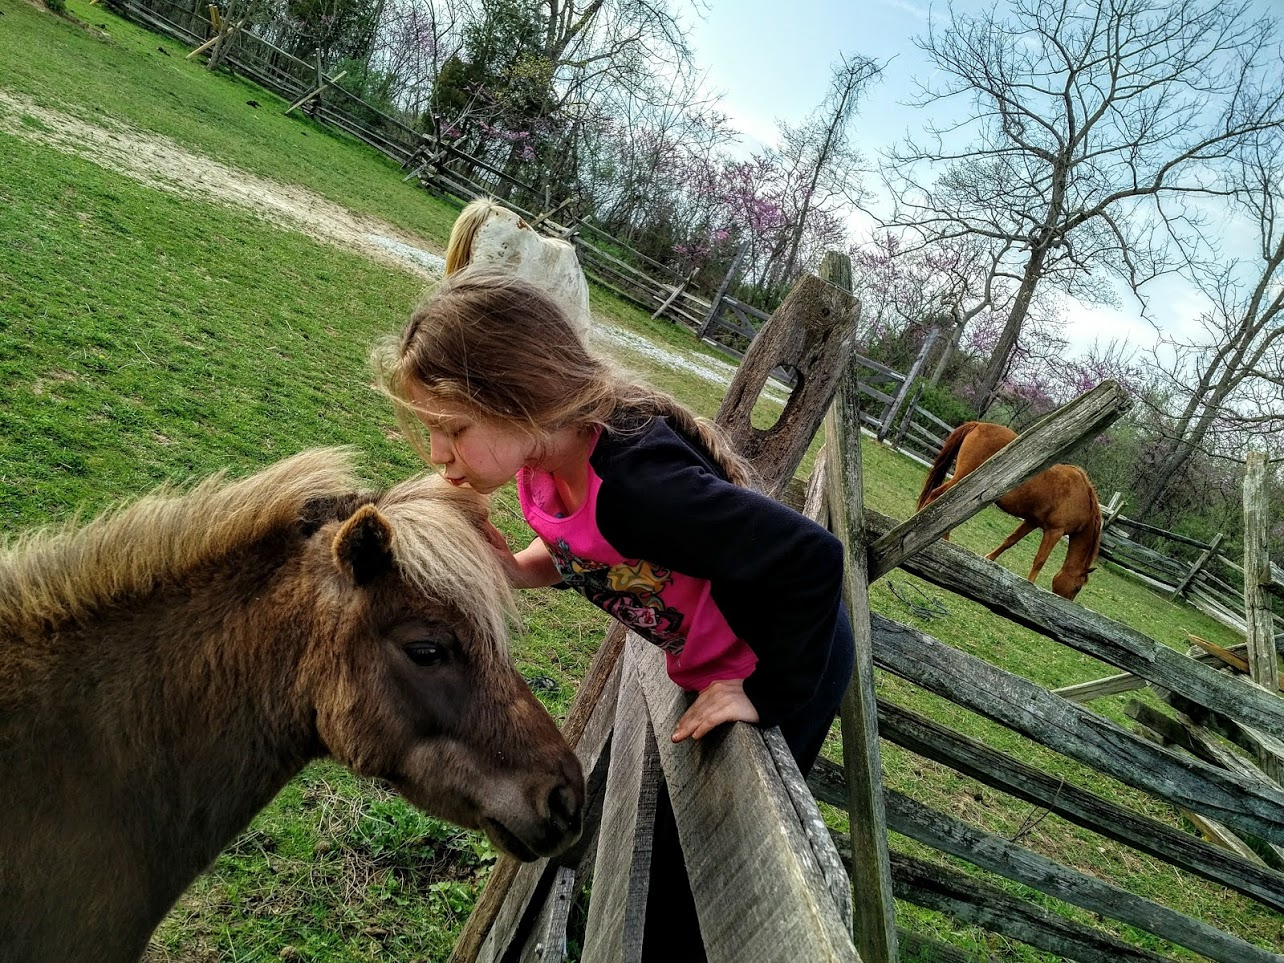 Child_Horse_Kiss.jpg